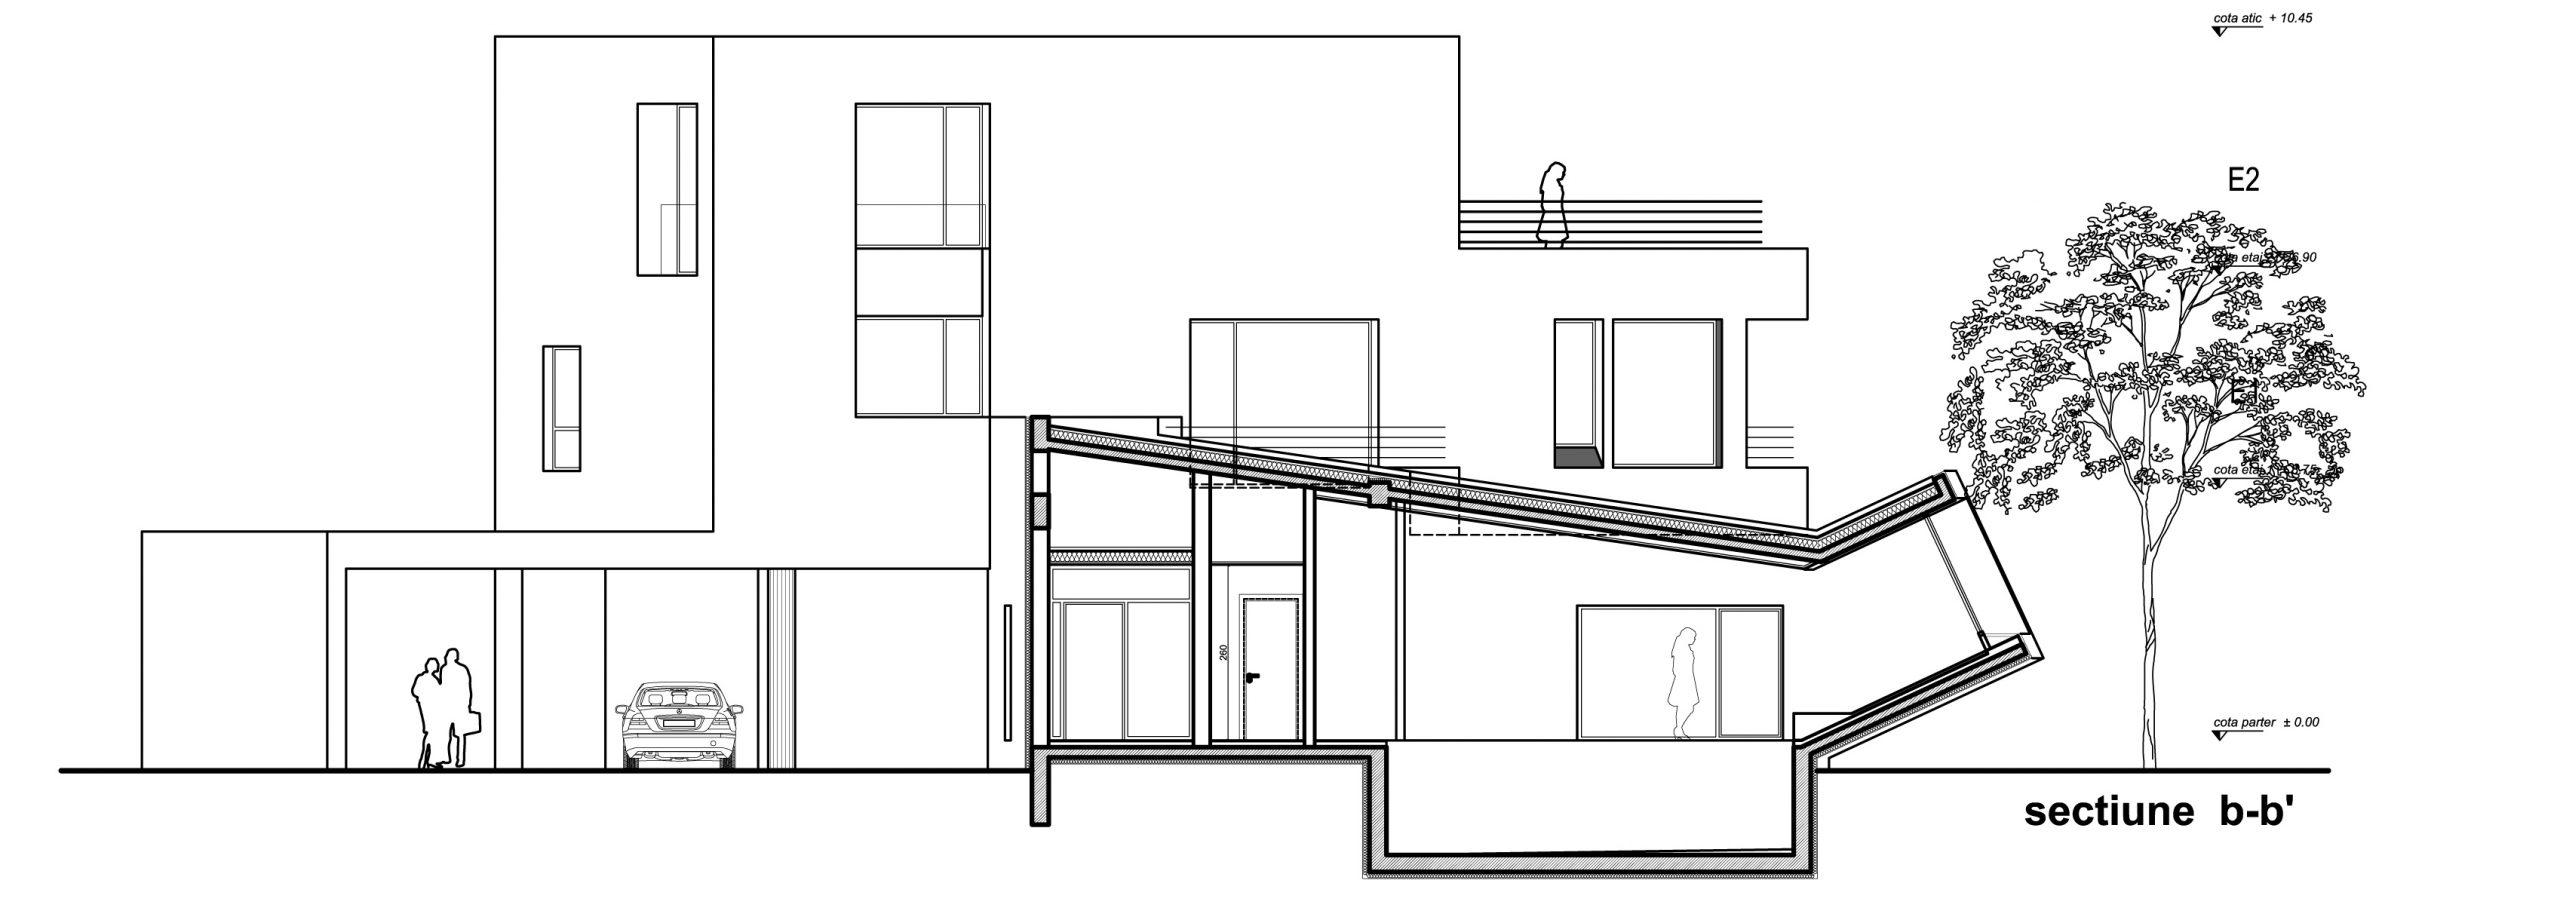 https://nbc-arhitect.ro/wp-content/uploads/2020/11/NBC-Arhitect-_-residences-_-Zamora-Villa-_-Romania-_-plans_2-scaled.jpg